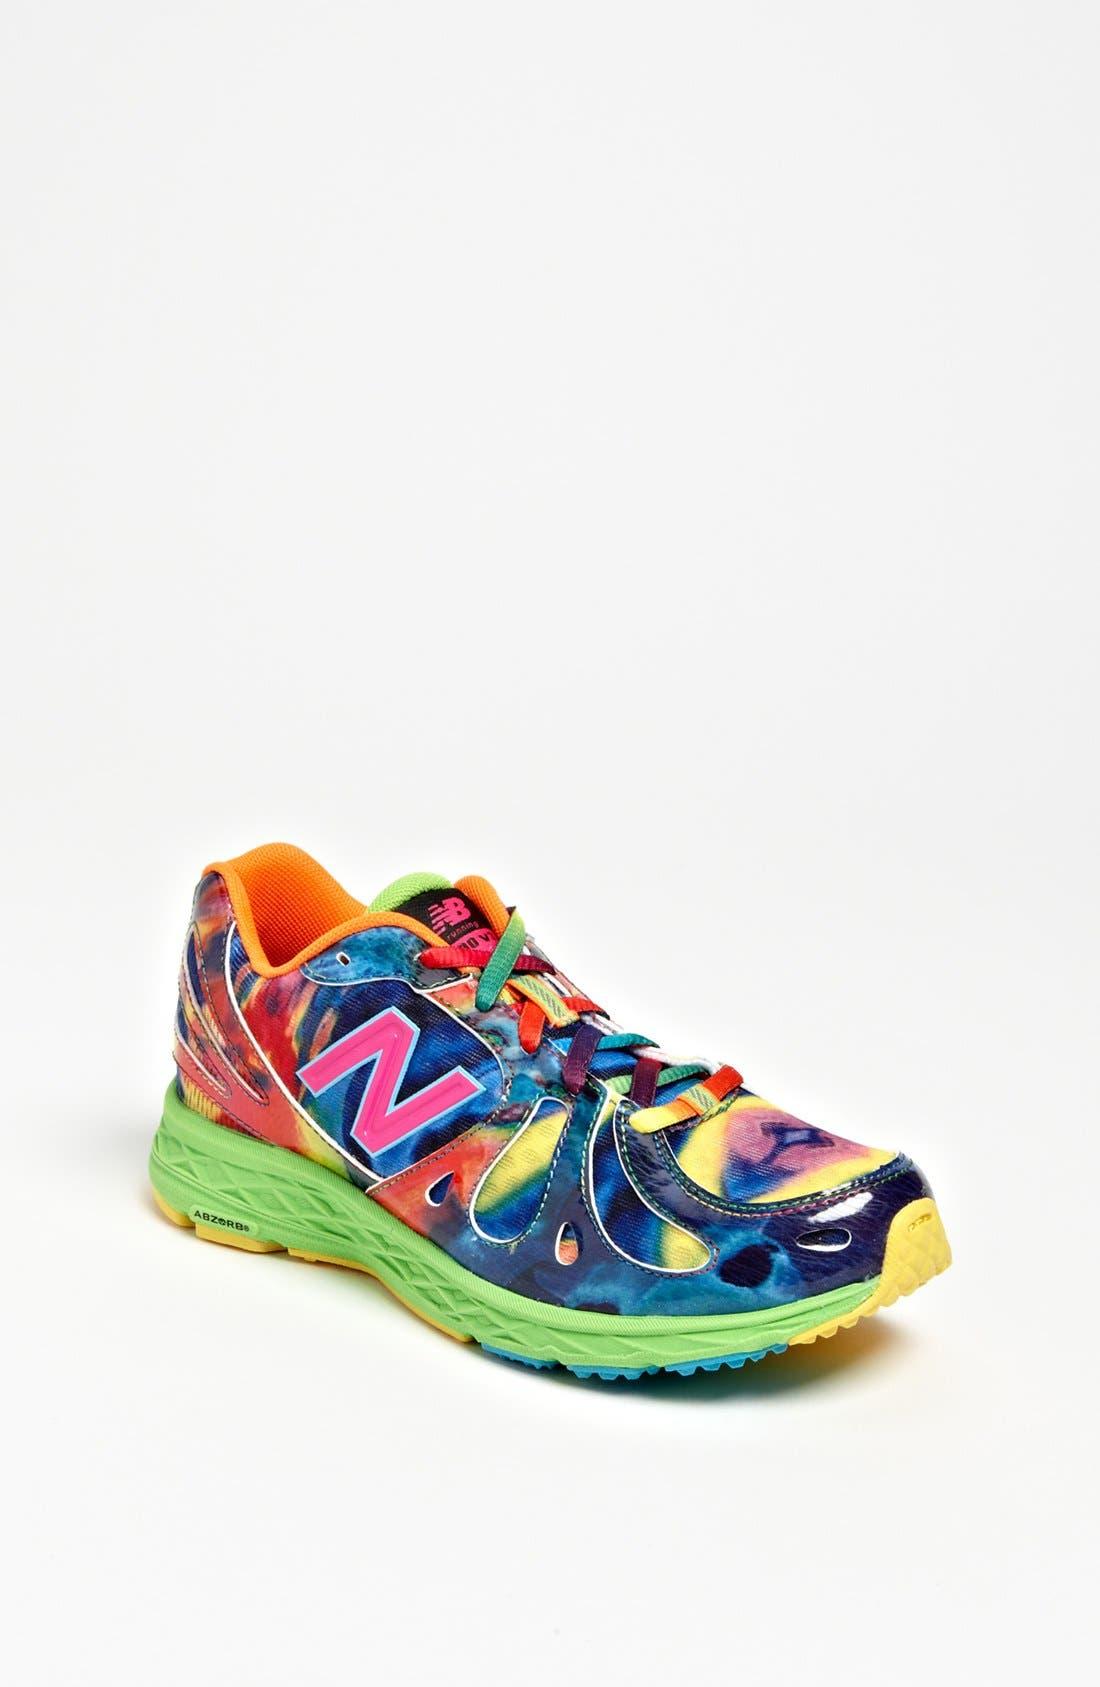 Main Image - New Balance '790 V3' Sneaker (Toddler, Little Kid & Big Kid)